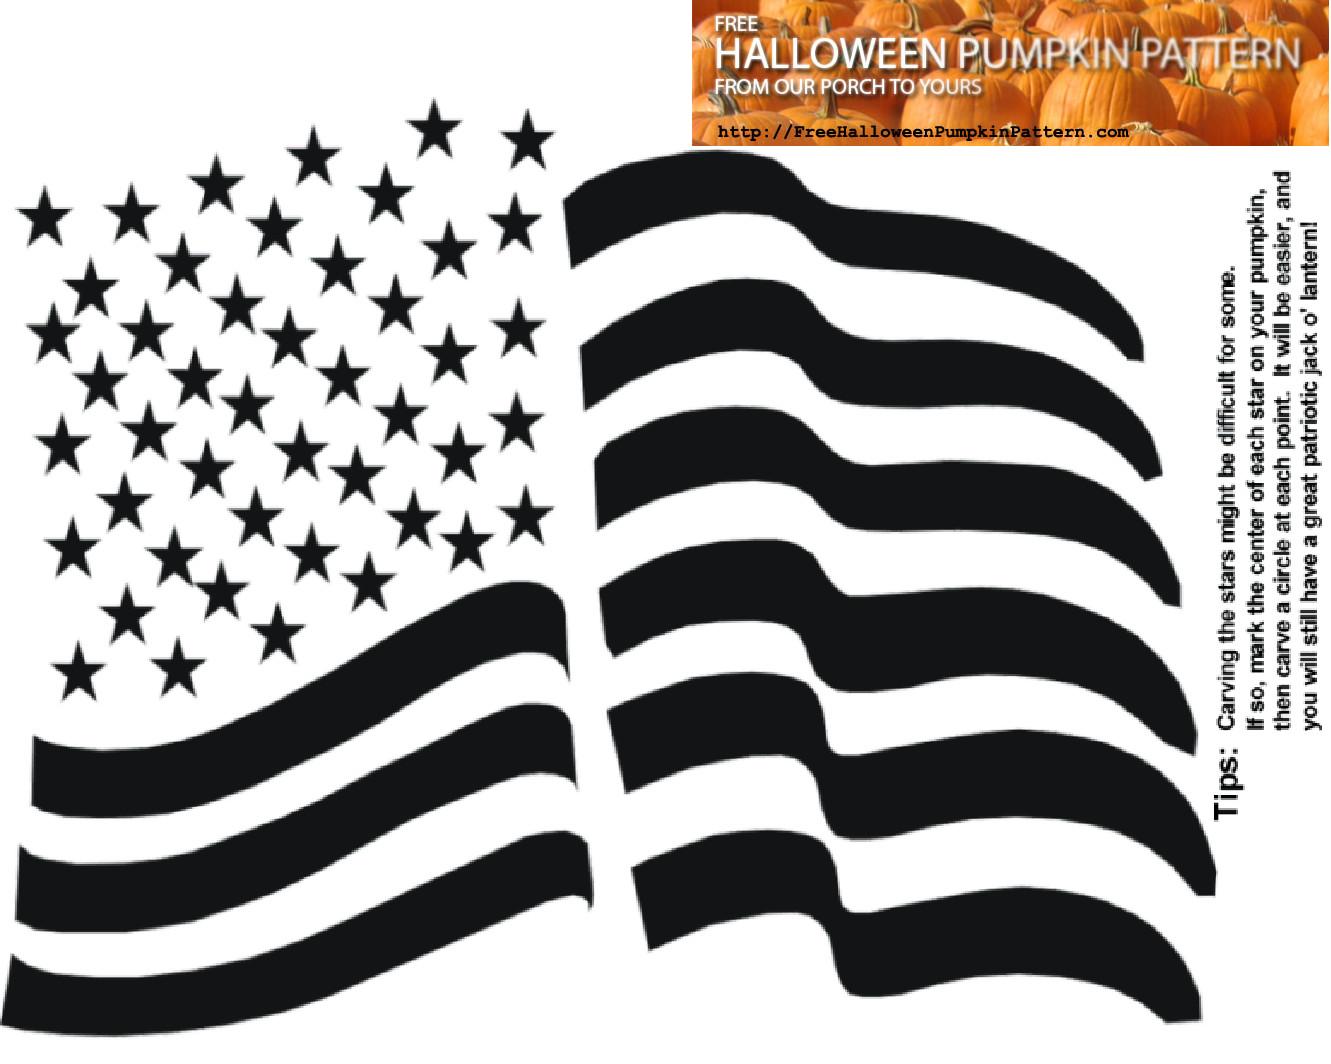 American Flag Pumpkin Carving Template Download A Free Halloween Pumpkin Pattern